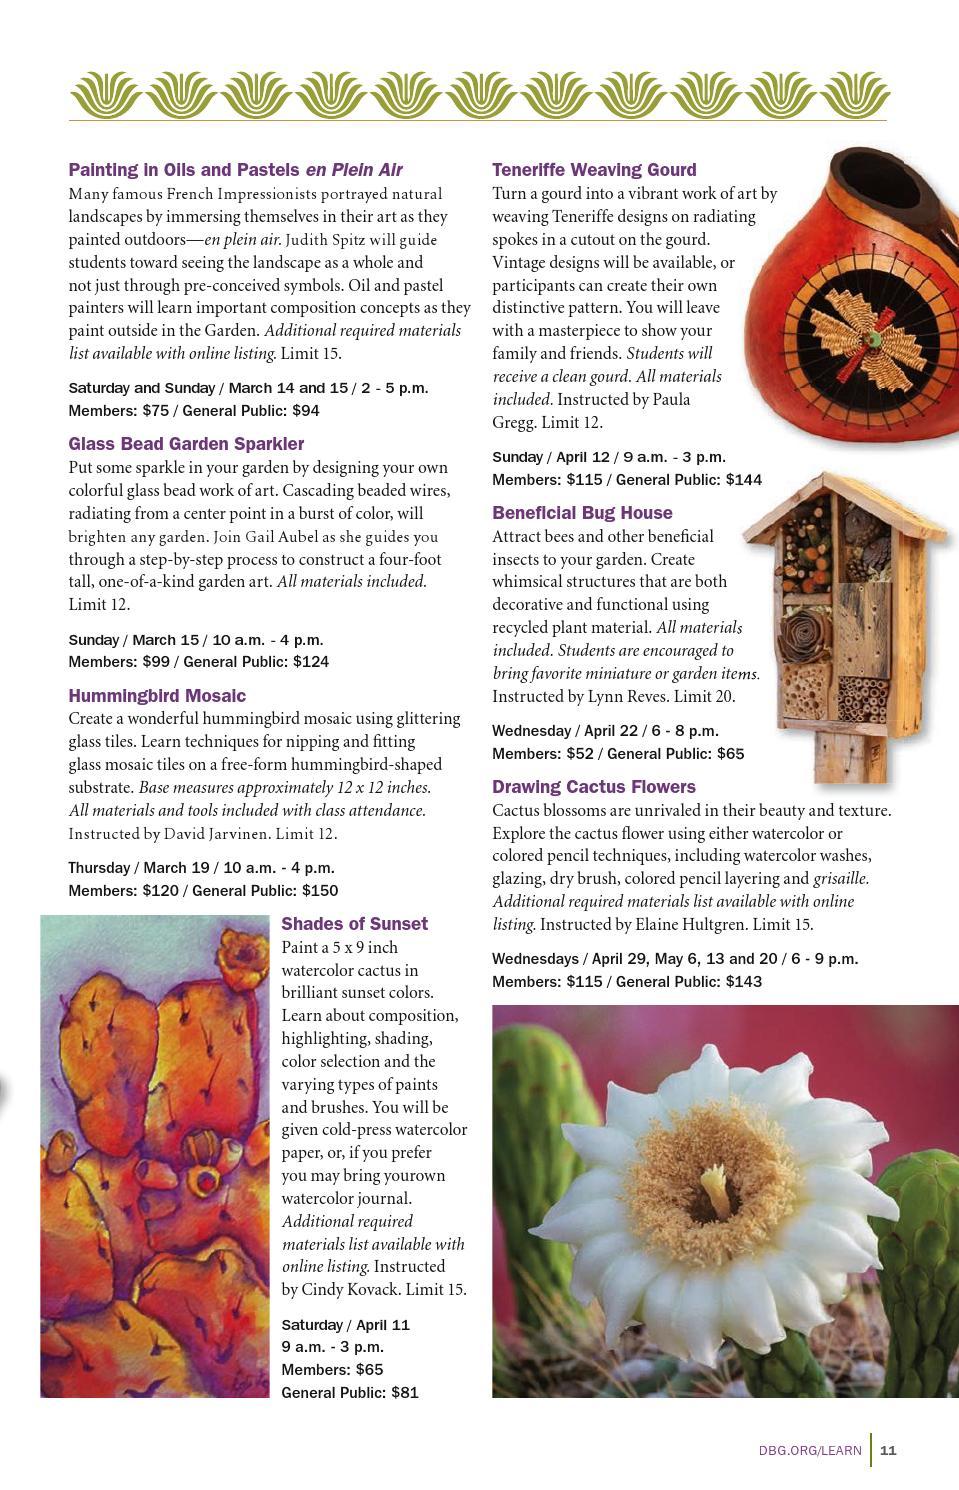 Garden Calendar Spring 2015 By Desert Botanical Garden Issuu